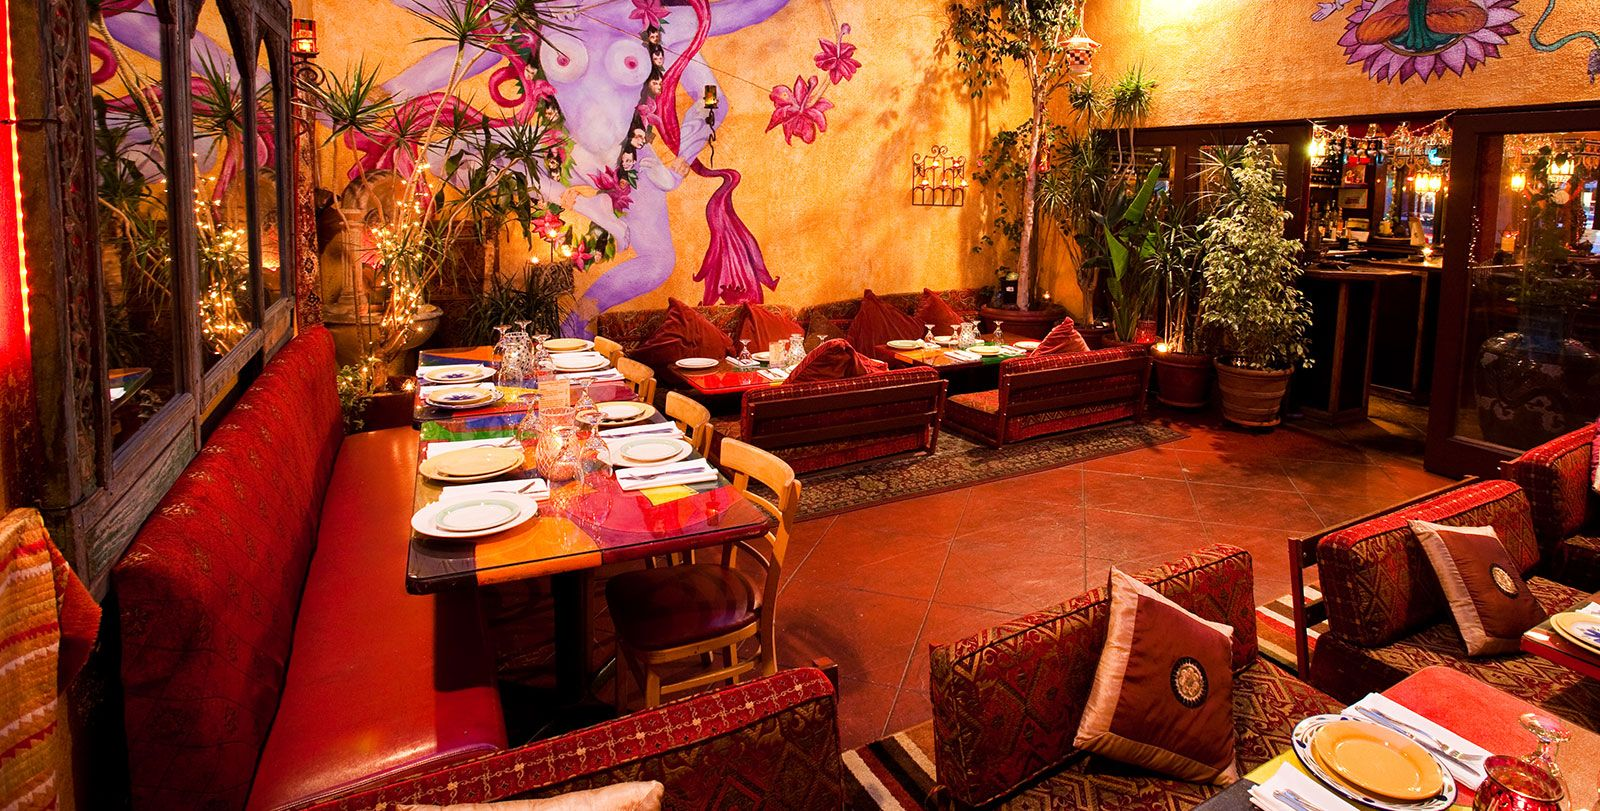 Electric Karma Amaz Vegan Indian Options Hollywood Santa Monica Vegan Indian Restaurant Indian Food Recipes